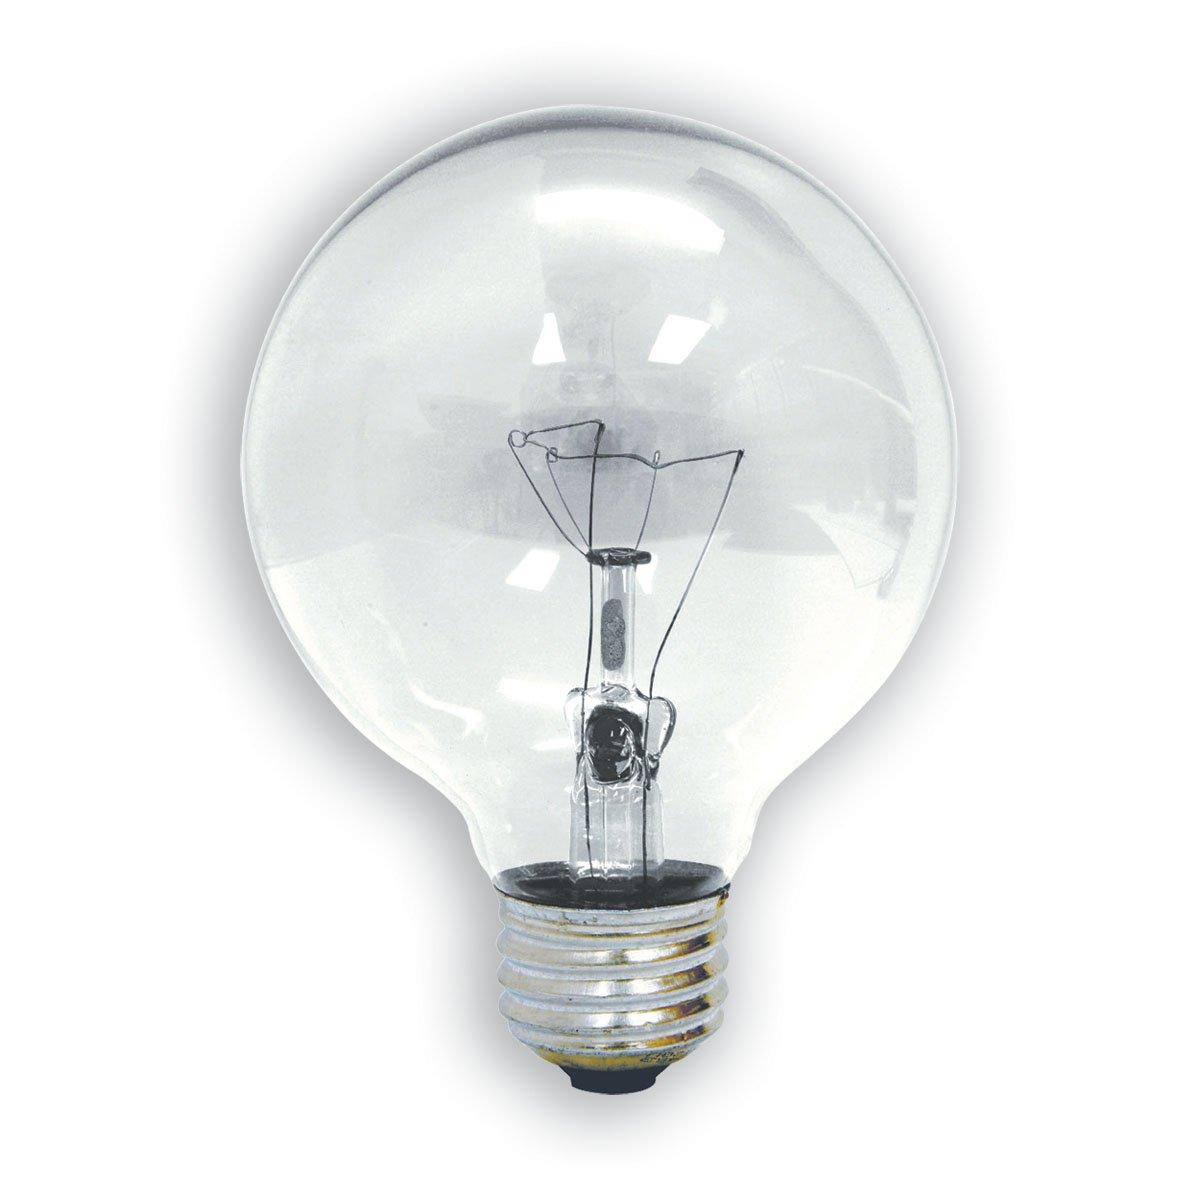 GE Crystal Clear 31109 40-Watt, 310-Lumen G16.5 Light Bulb with Medium Base, 2-Pack